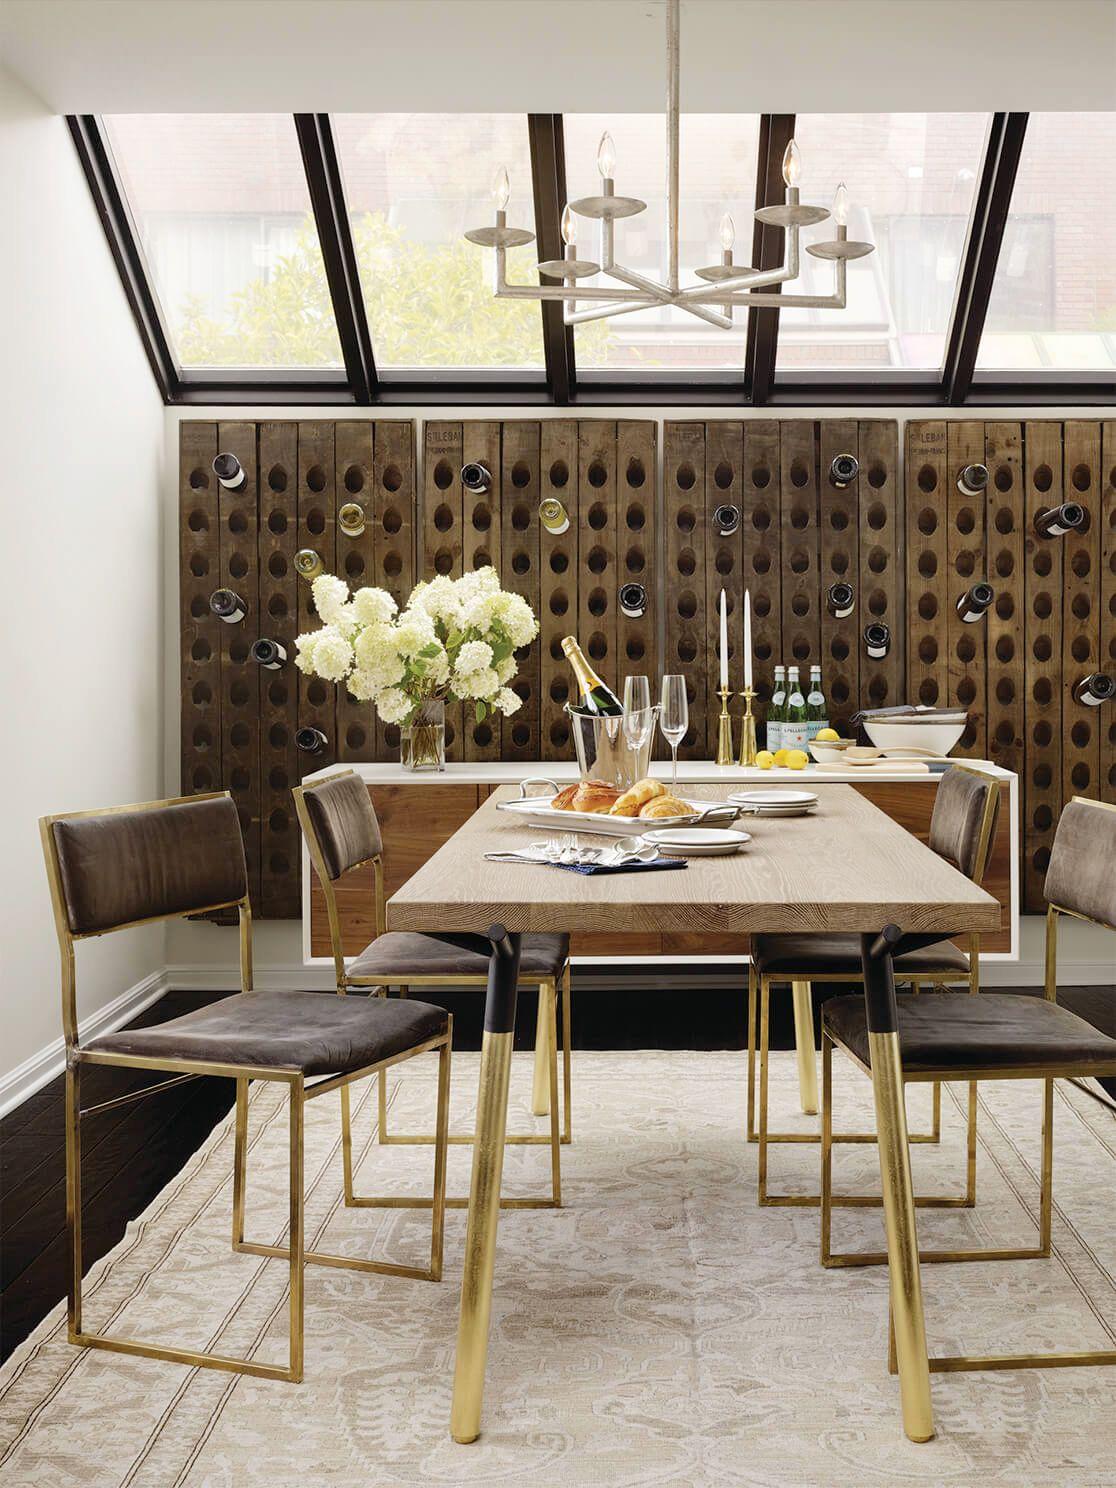 30 Best Home Bar Ideas - Cool Home Bar Designs, Furniture ...